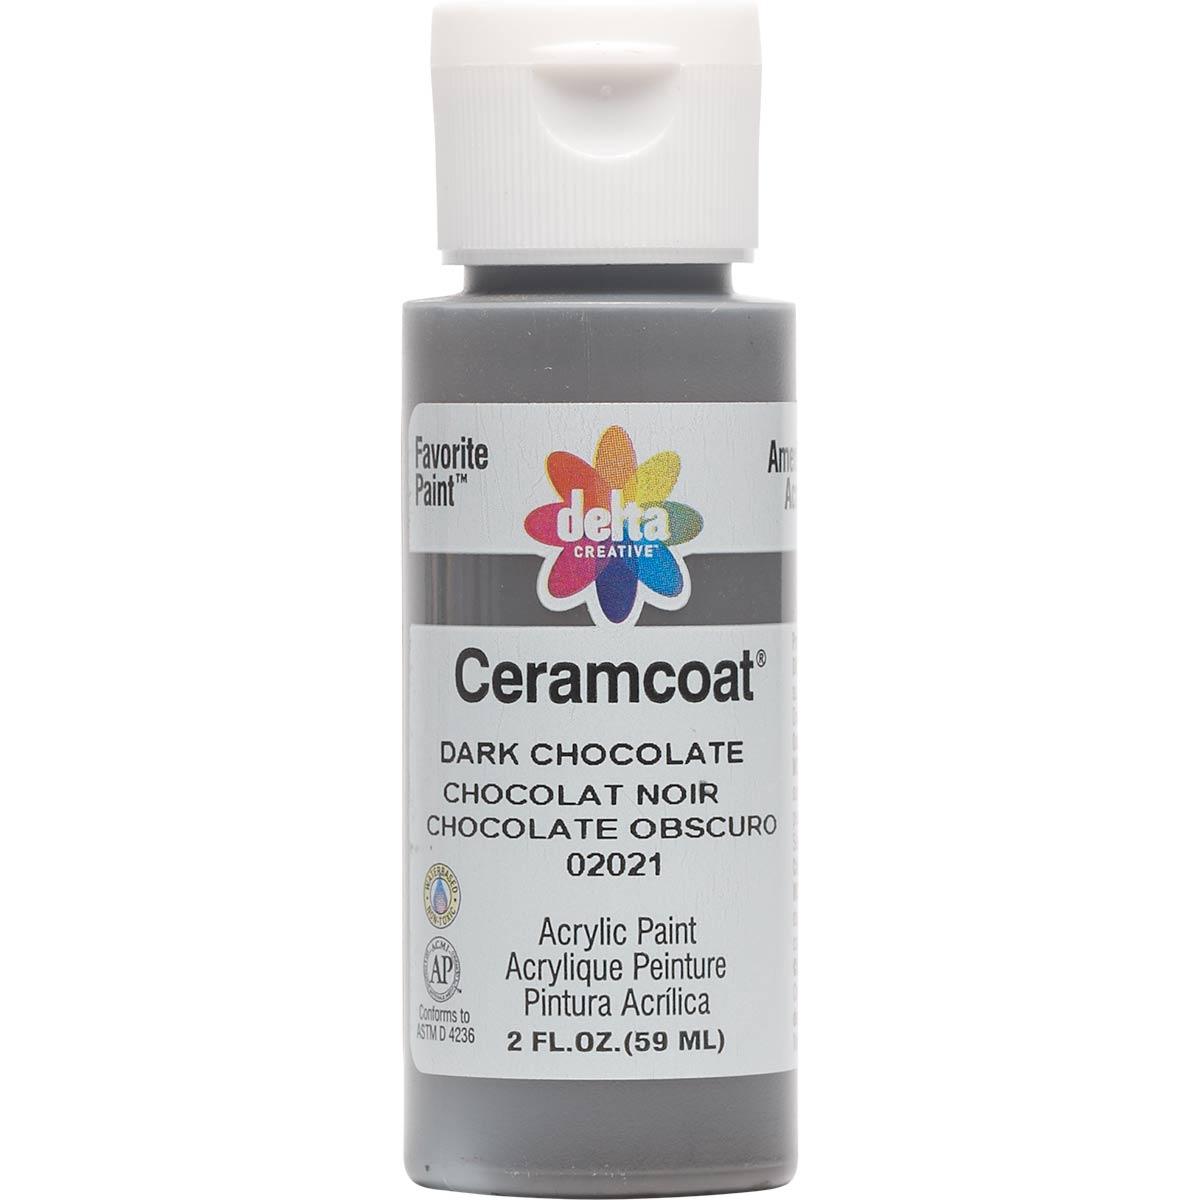 Delta Ceramcoat ® Acrylic Paint - Dark Chocolate, 2 oz. - 020210202W